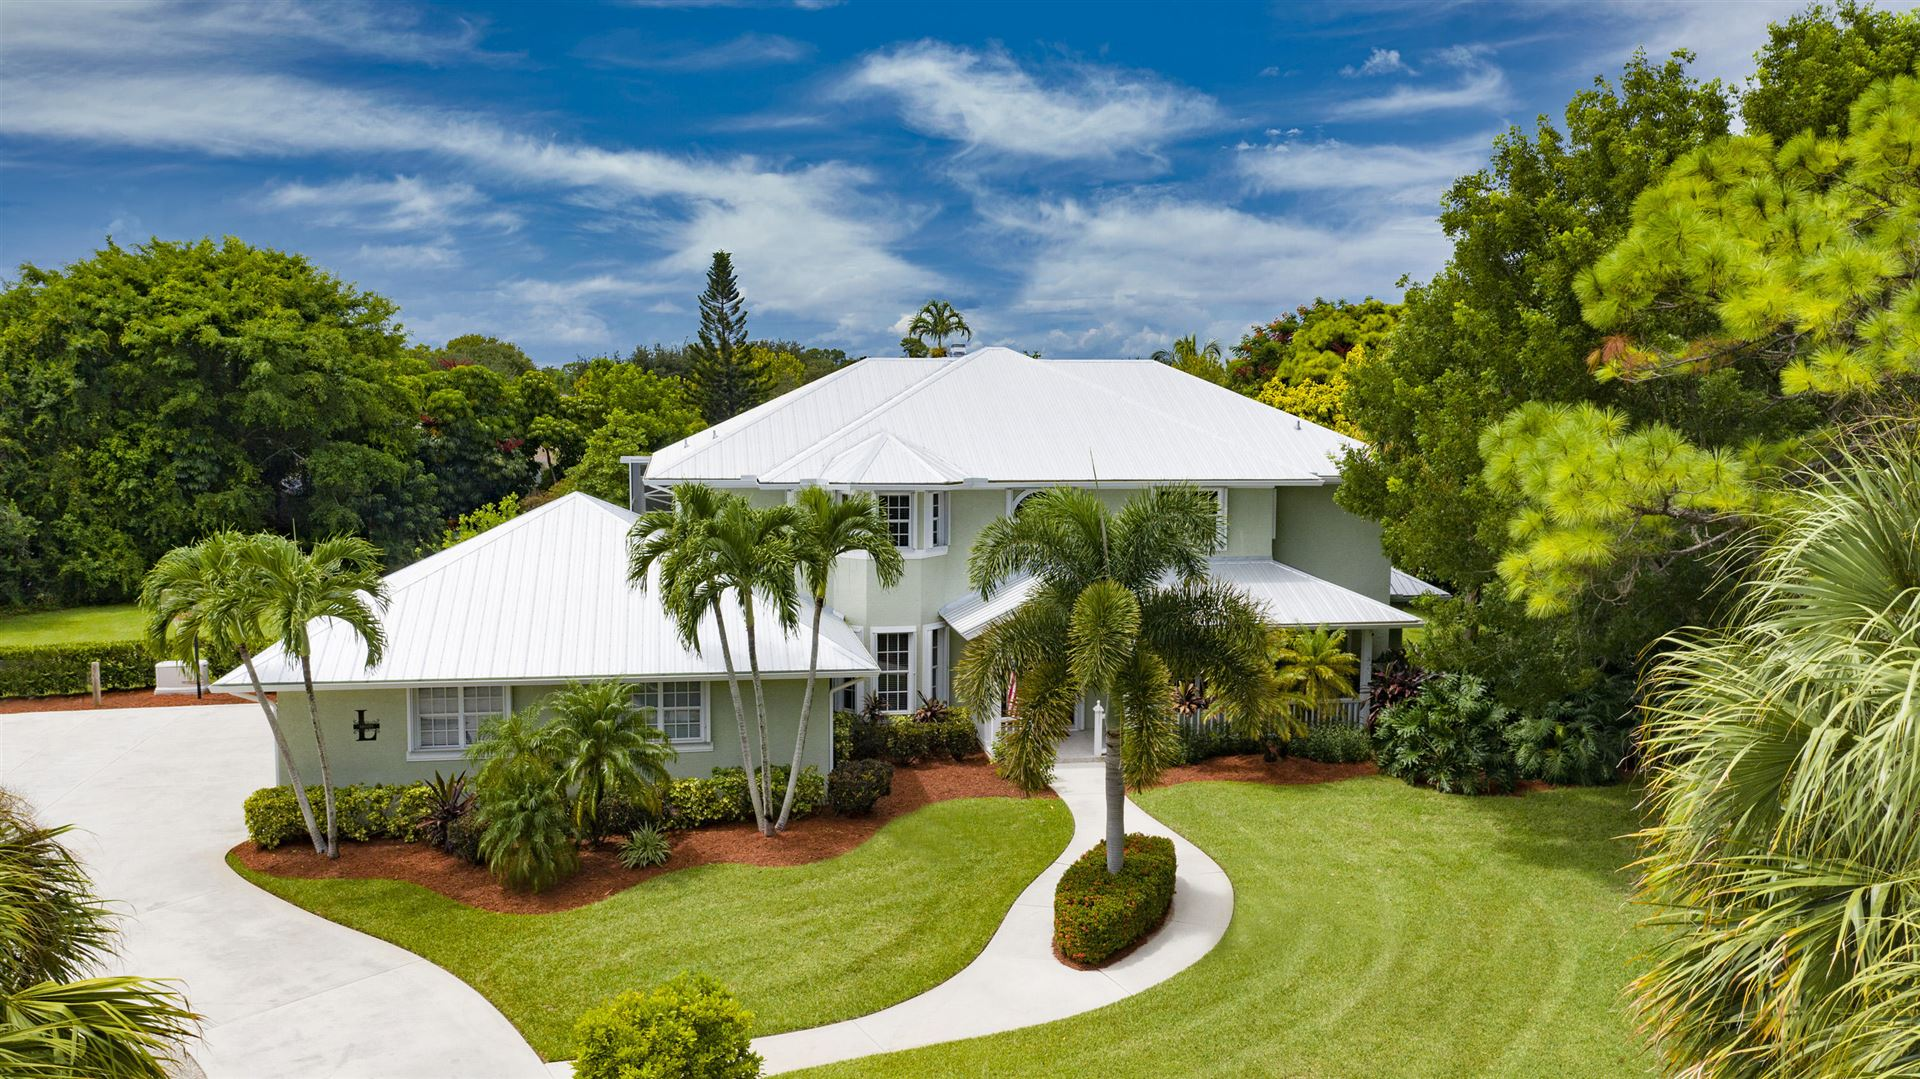 327 NE Ficus Terrace, Jensen Beach, FL 34957 - #: RX-10654269